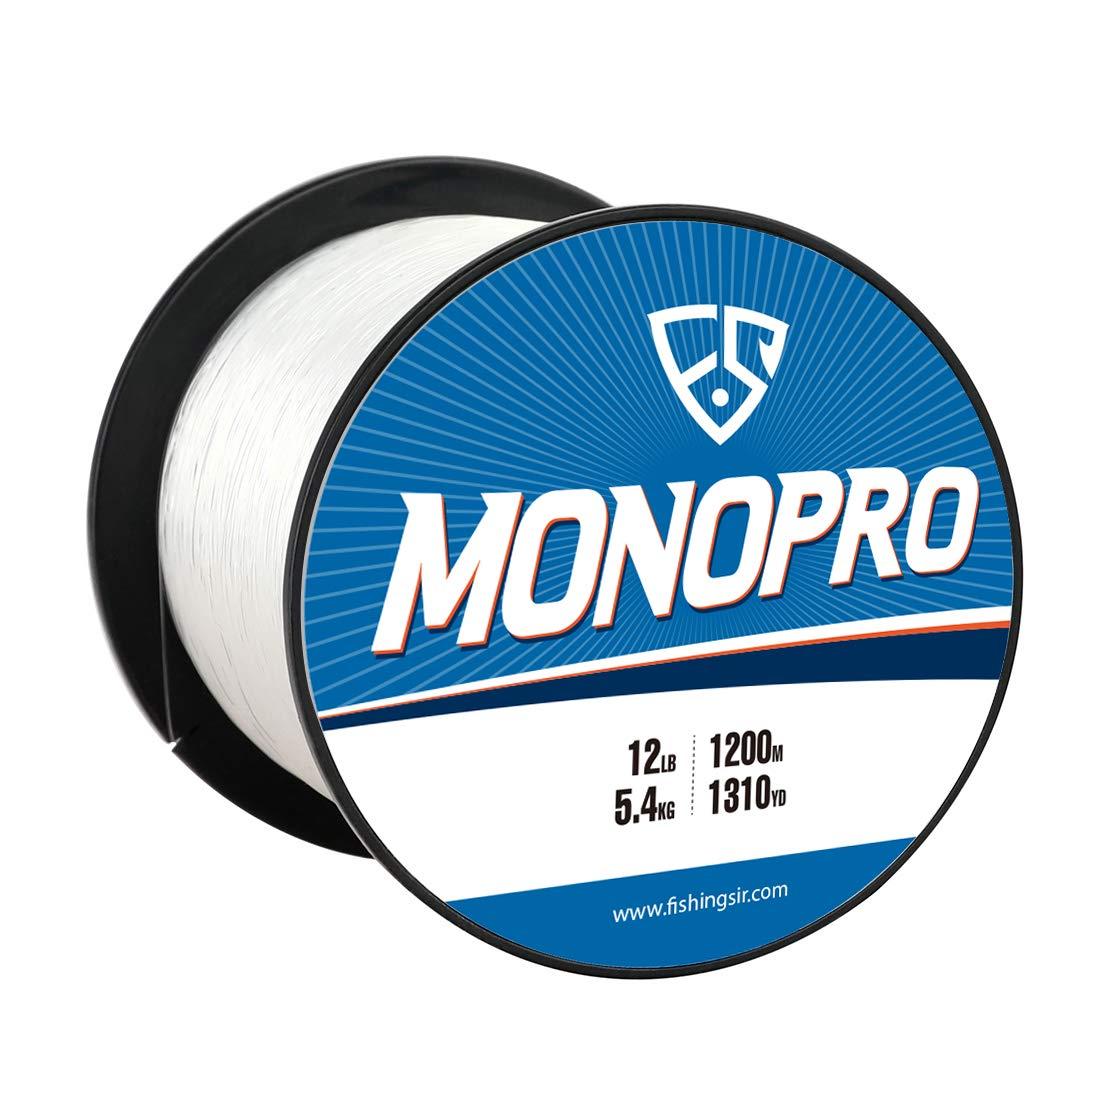 FISHINGSIR MonoPro Monofilament Fishing Line – Premium Mono Nylon Lines – Superior Strong and 30 Higher Abrasion Resistance, 175-3280Yds, 4LB-130LB